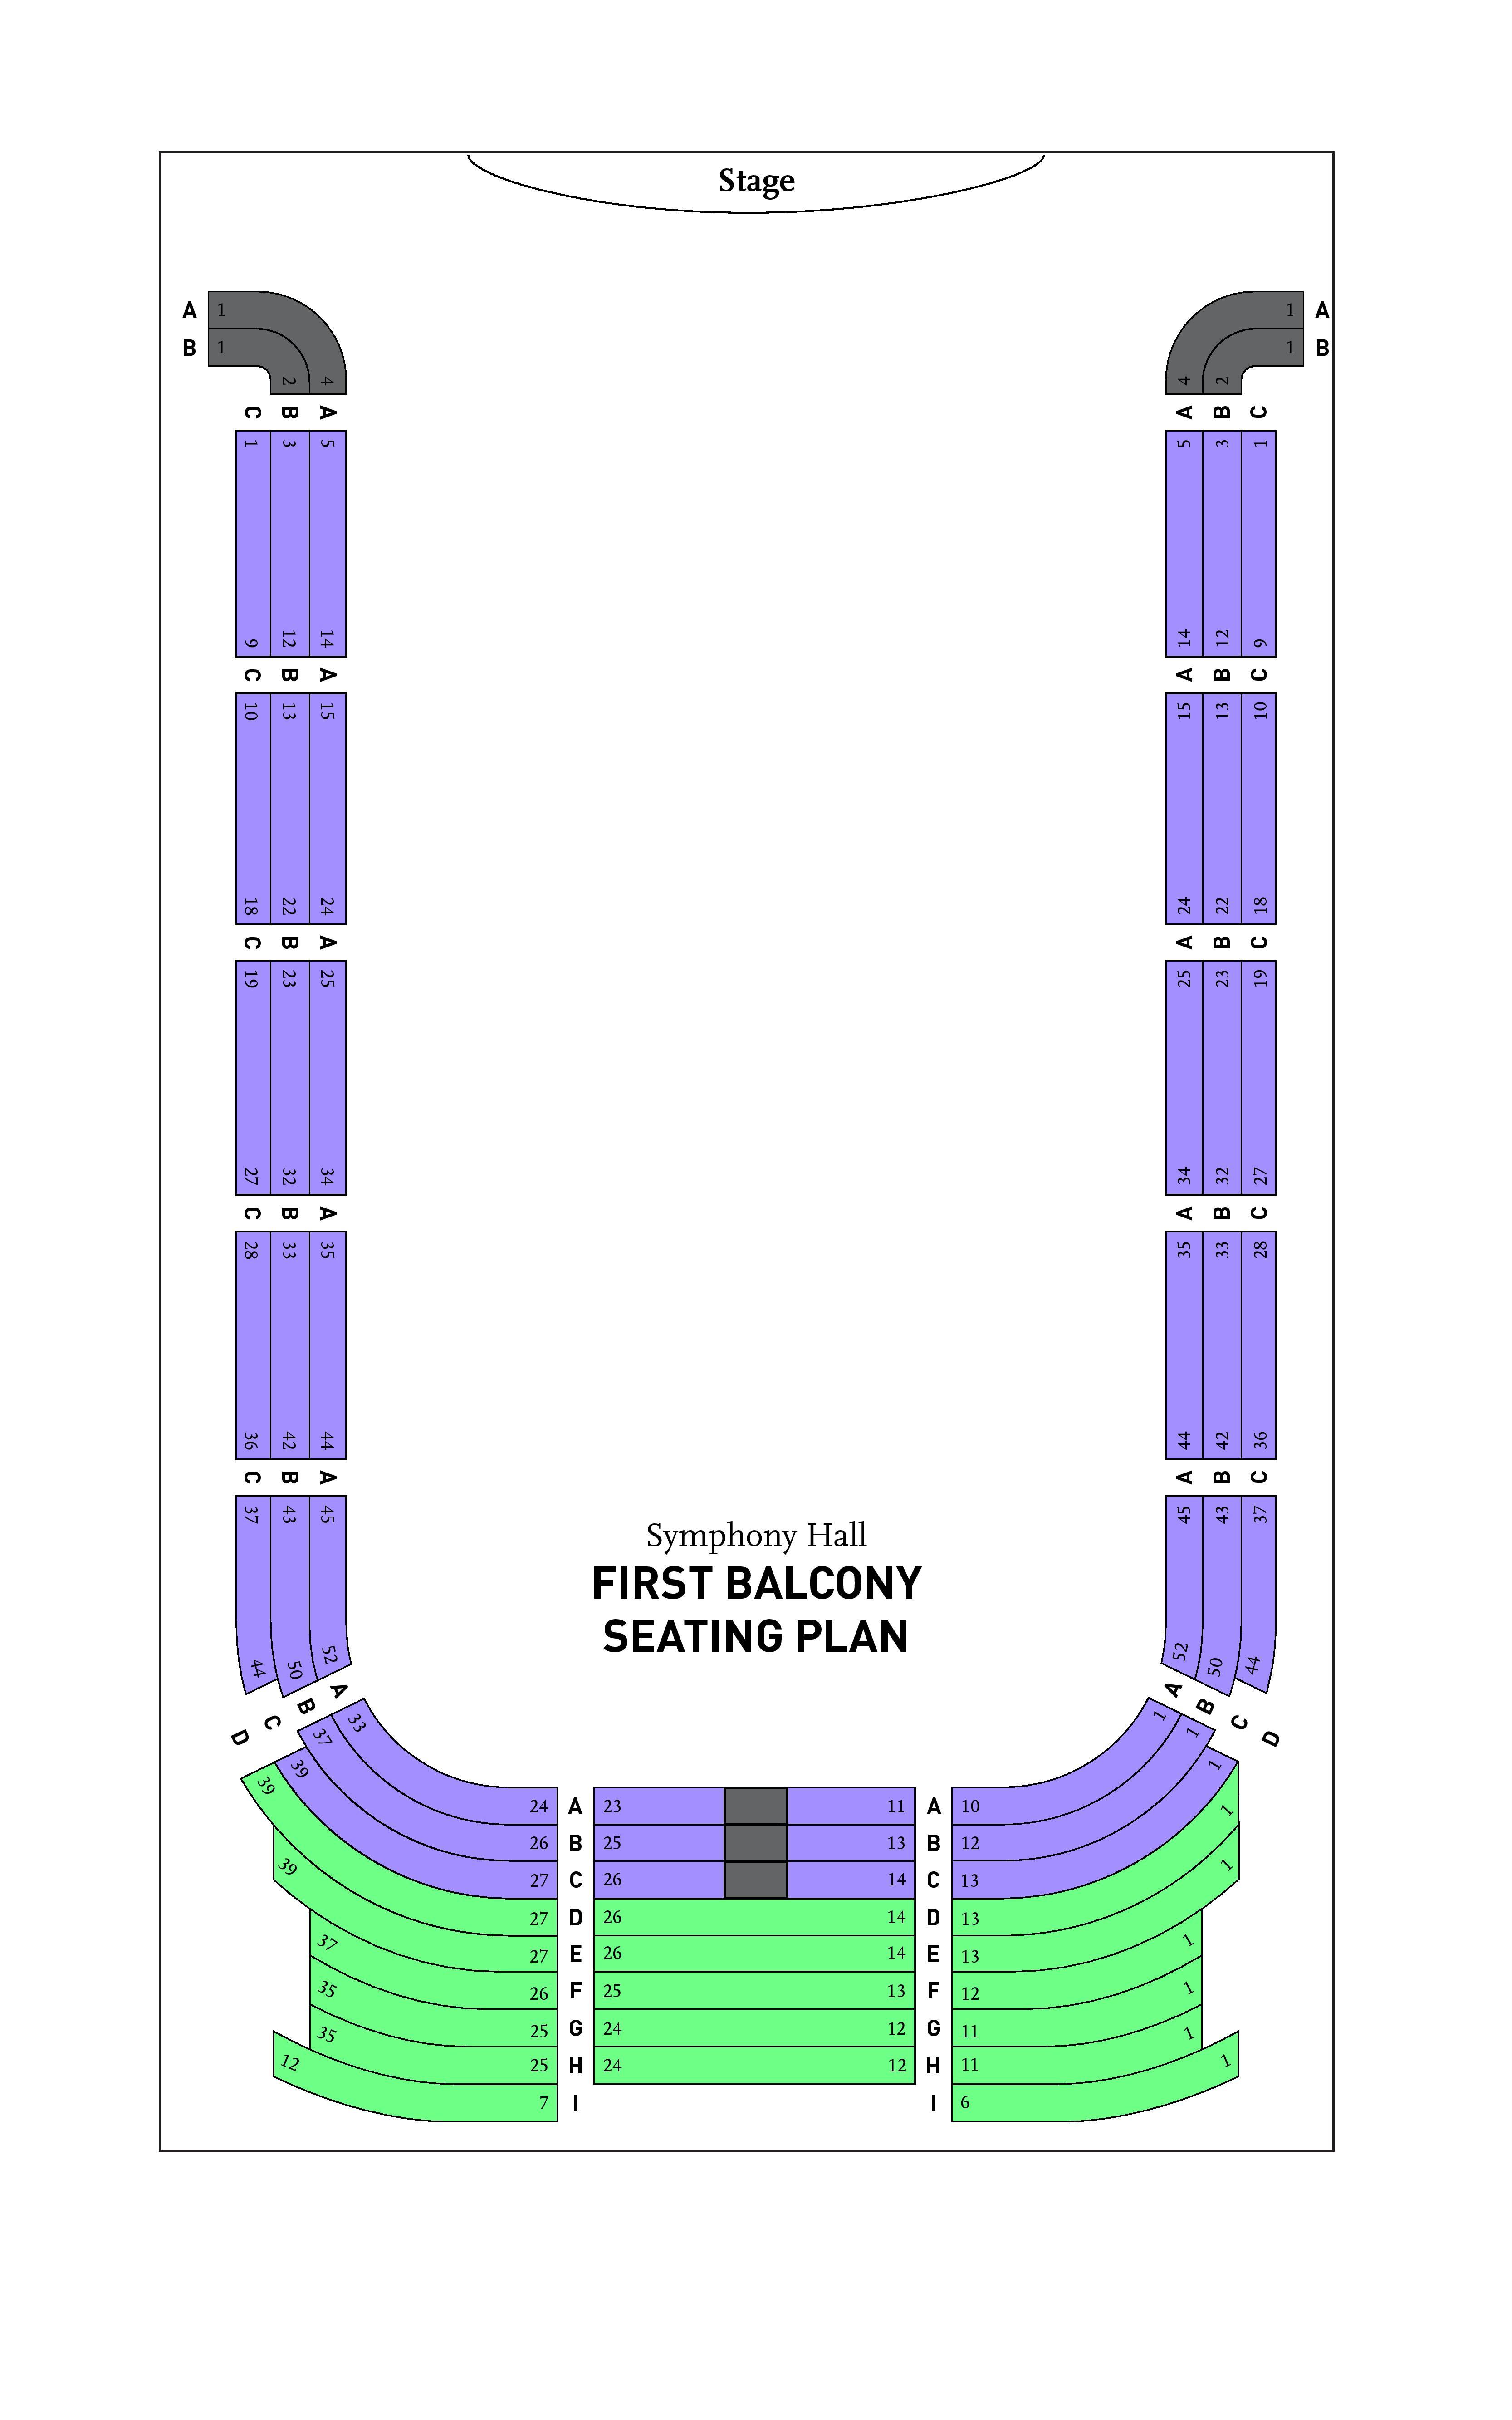 BPYO Symphony Hall First Balcony Seating Chart